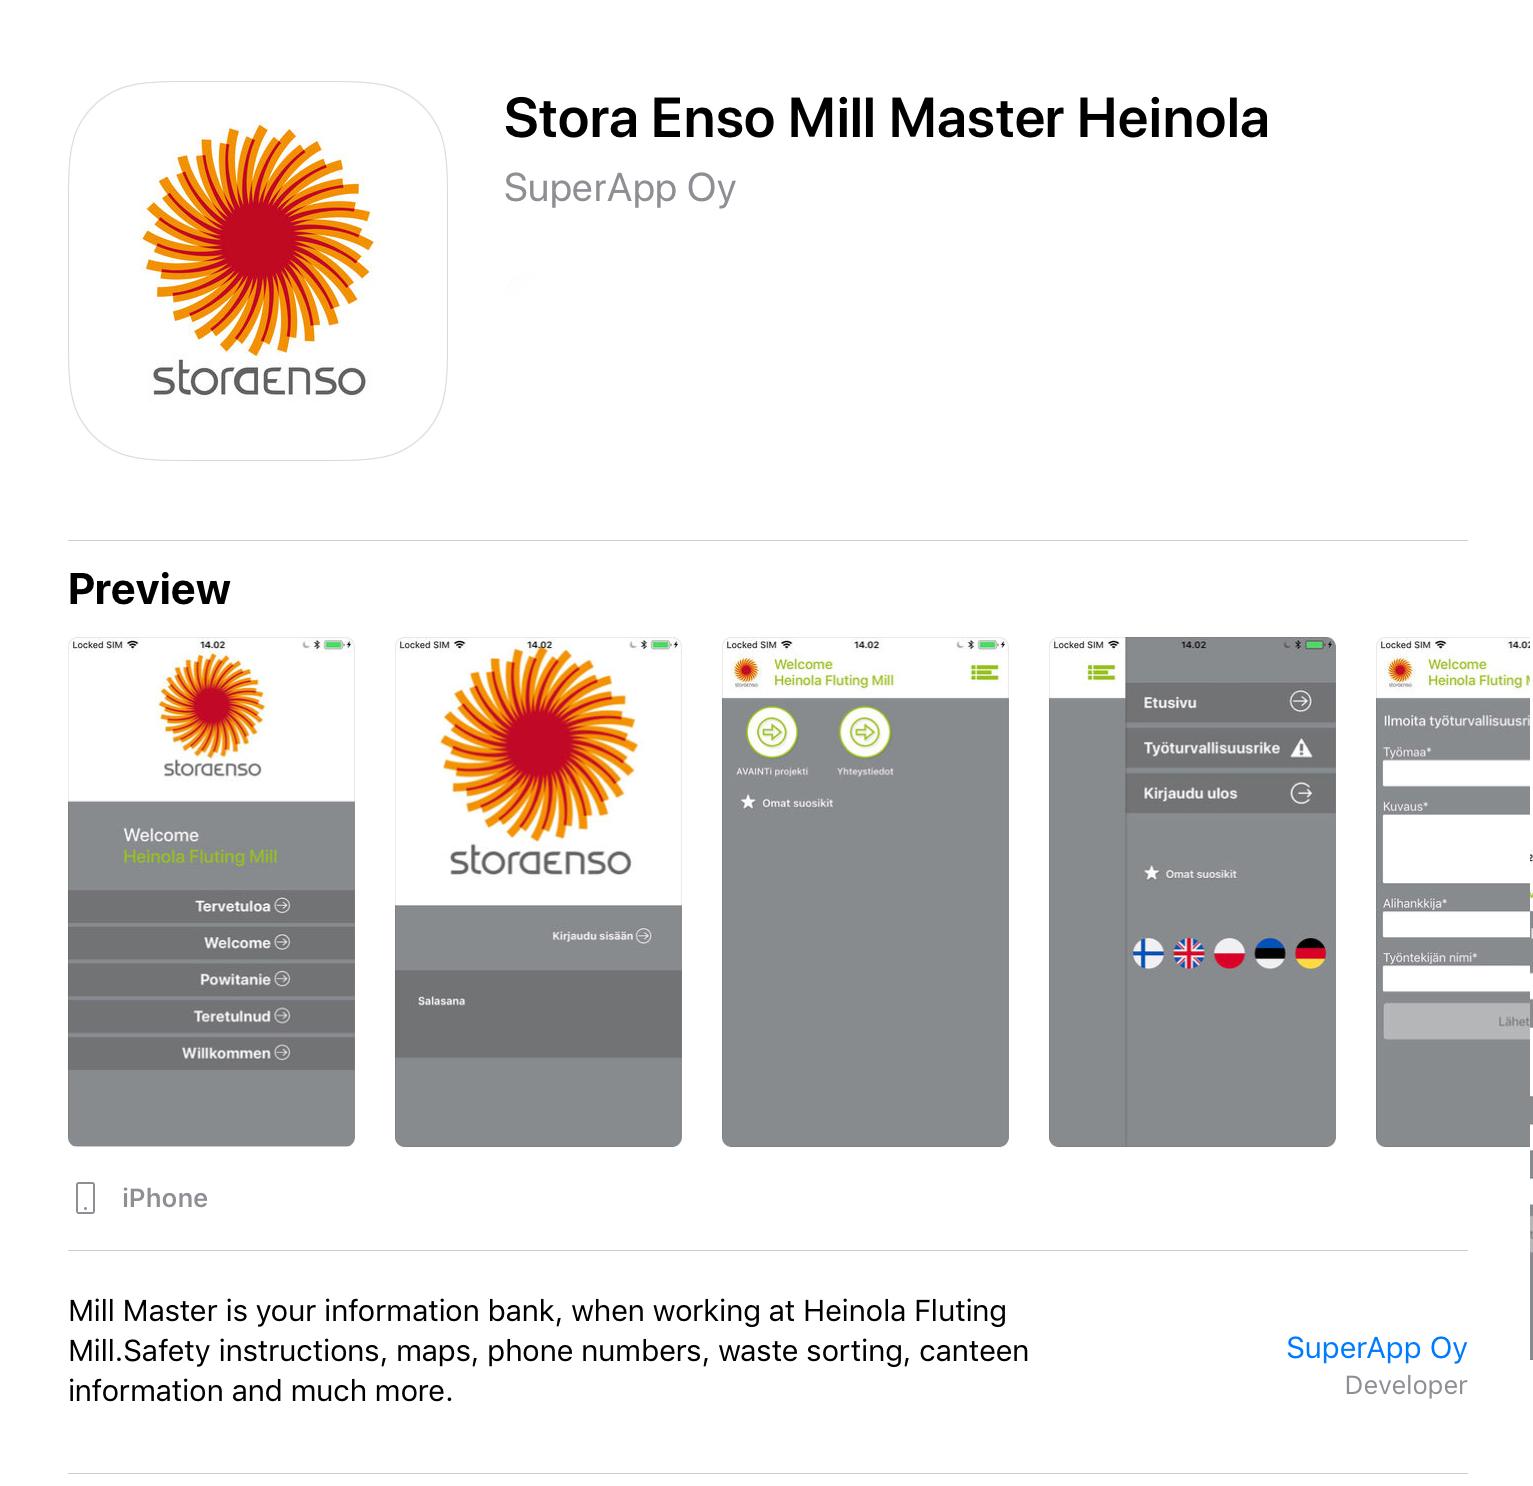 Stora Enso - SuperApp